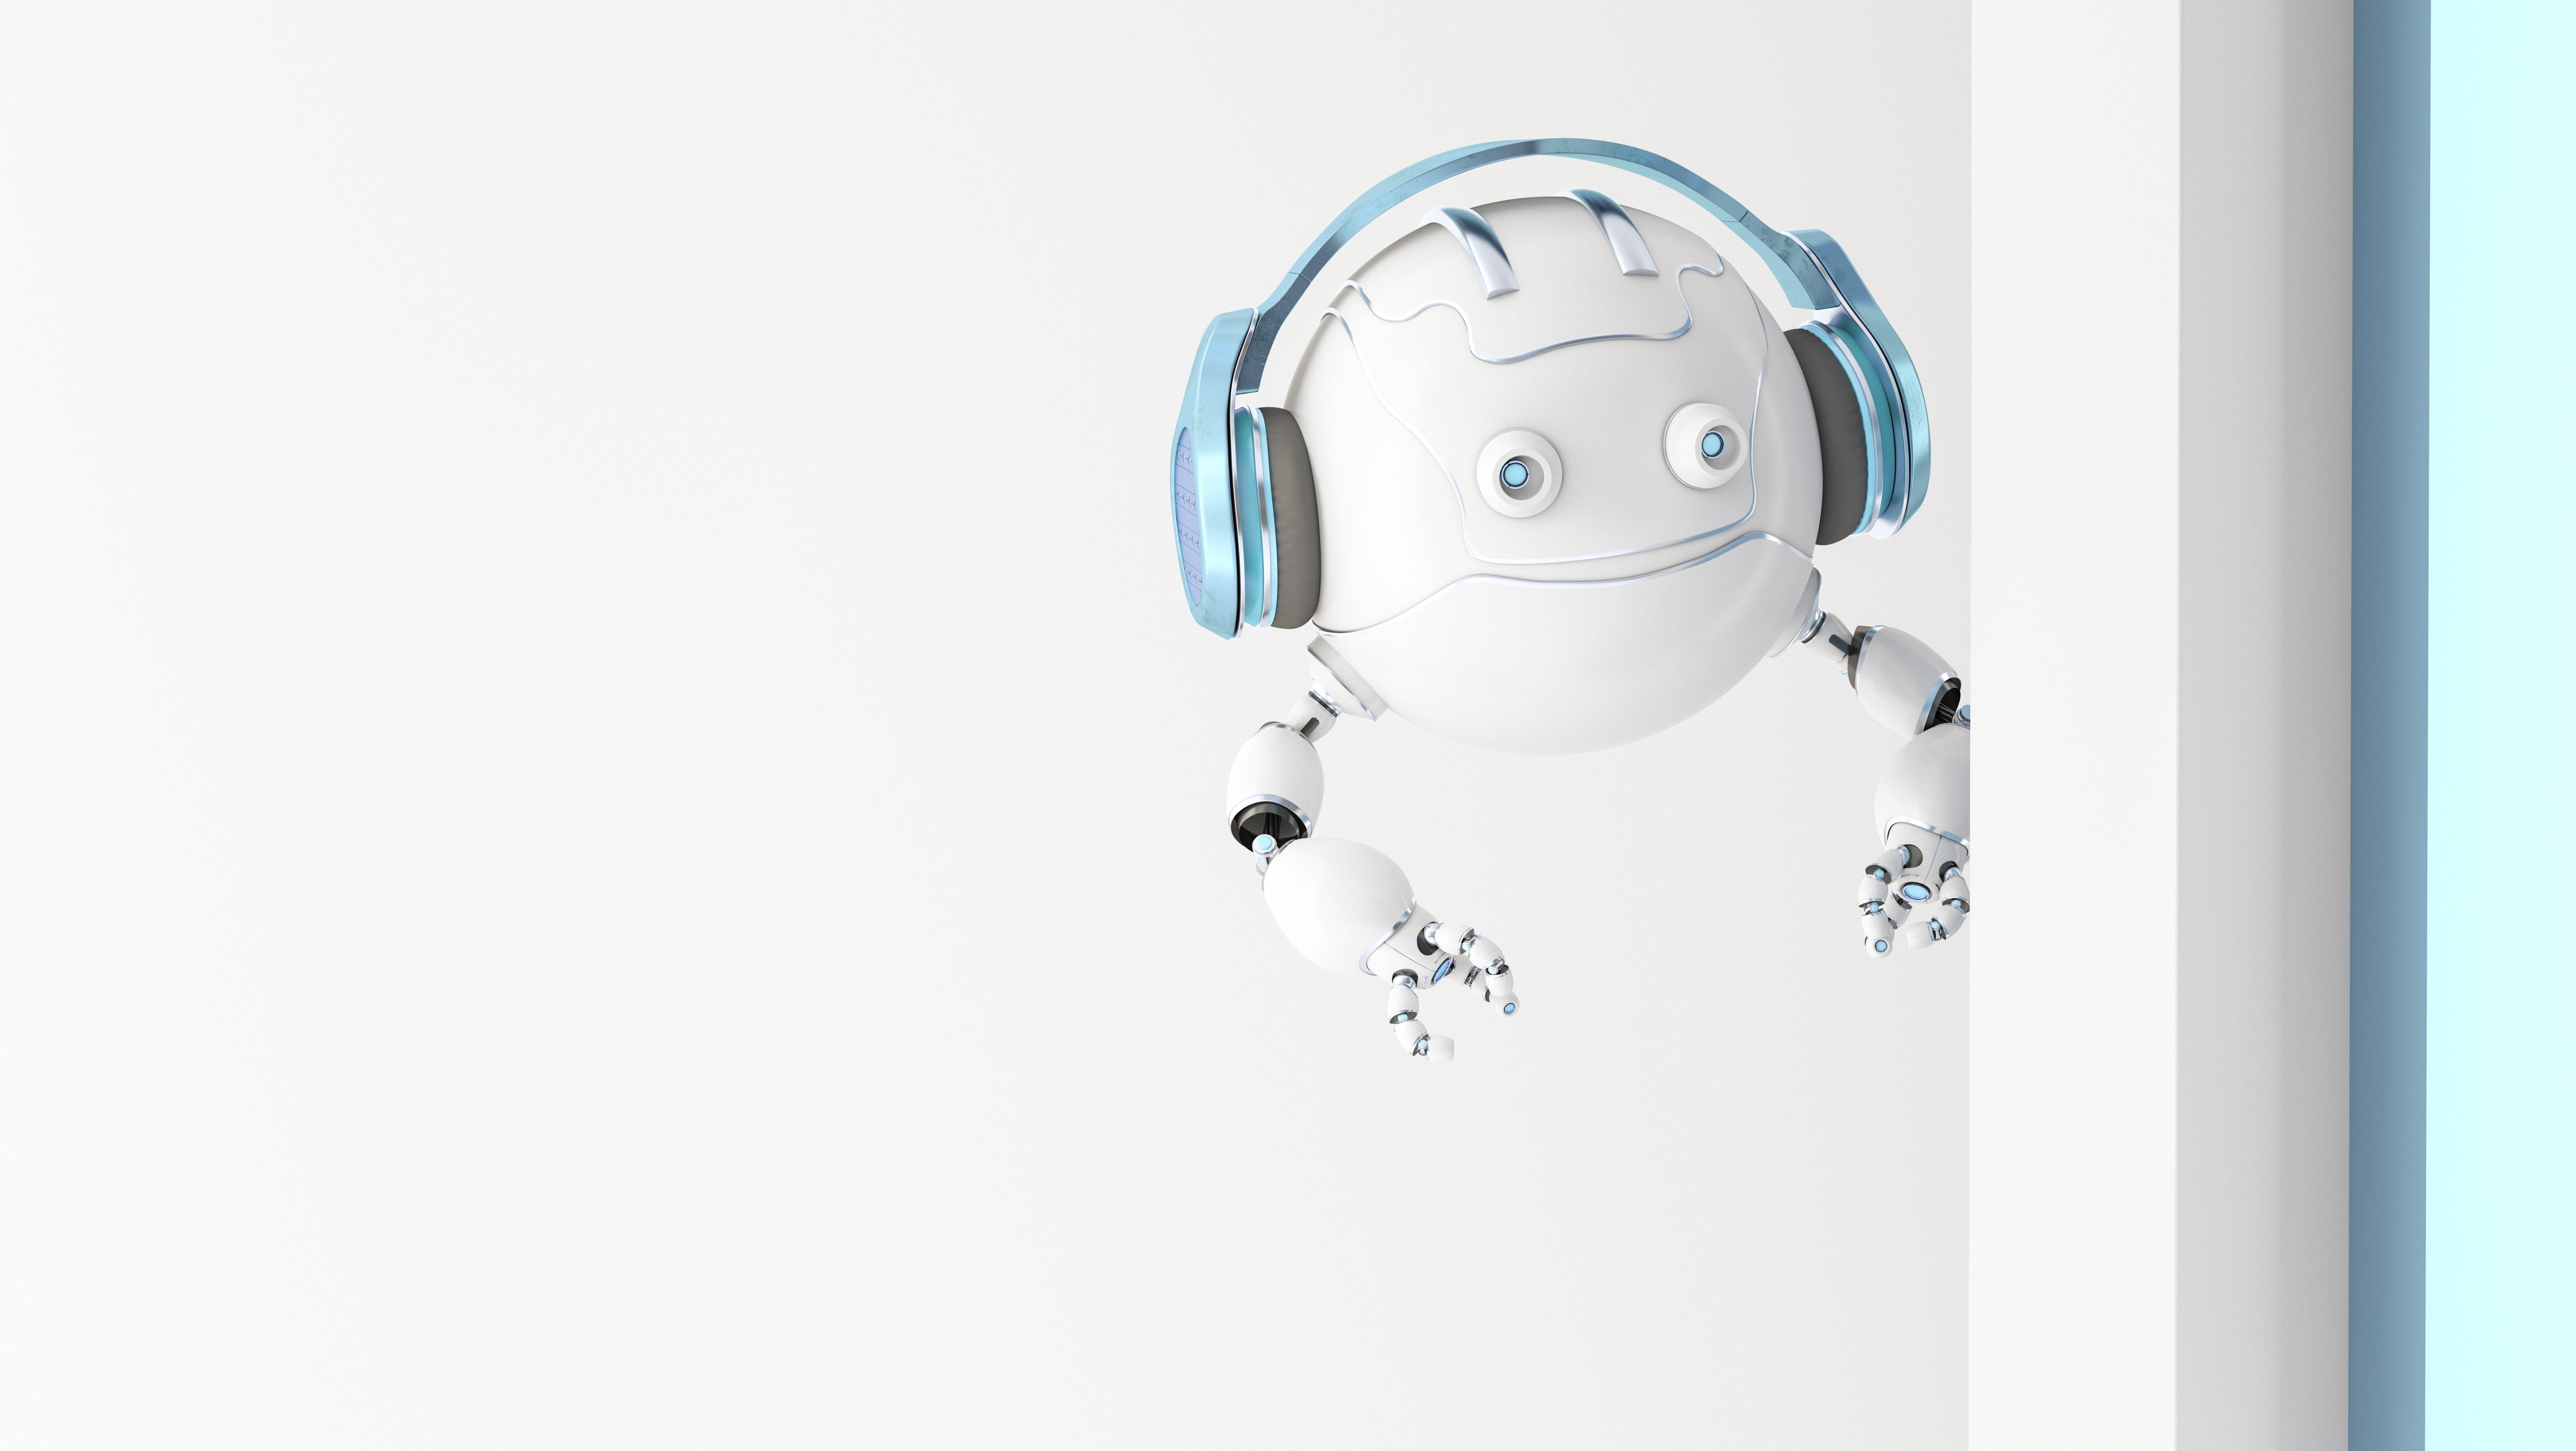 Drone wearing headphones.